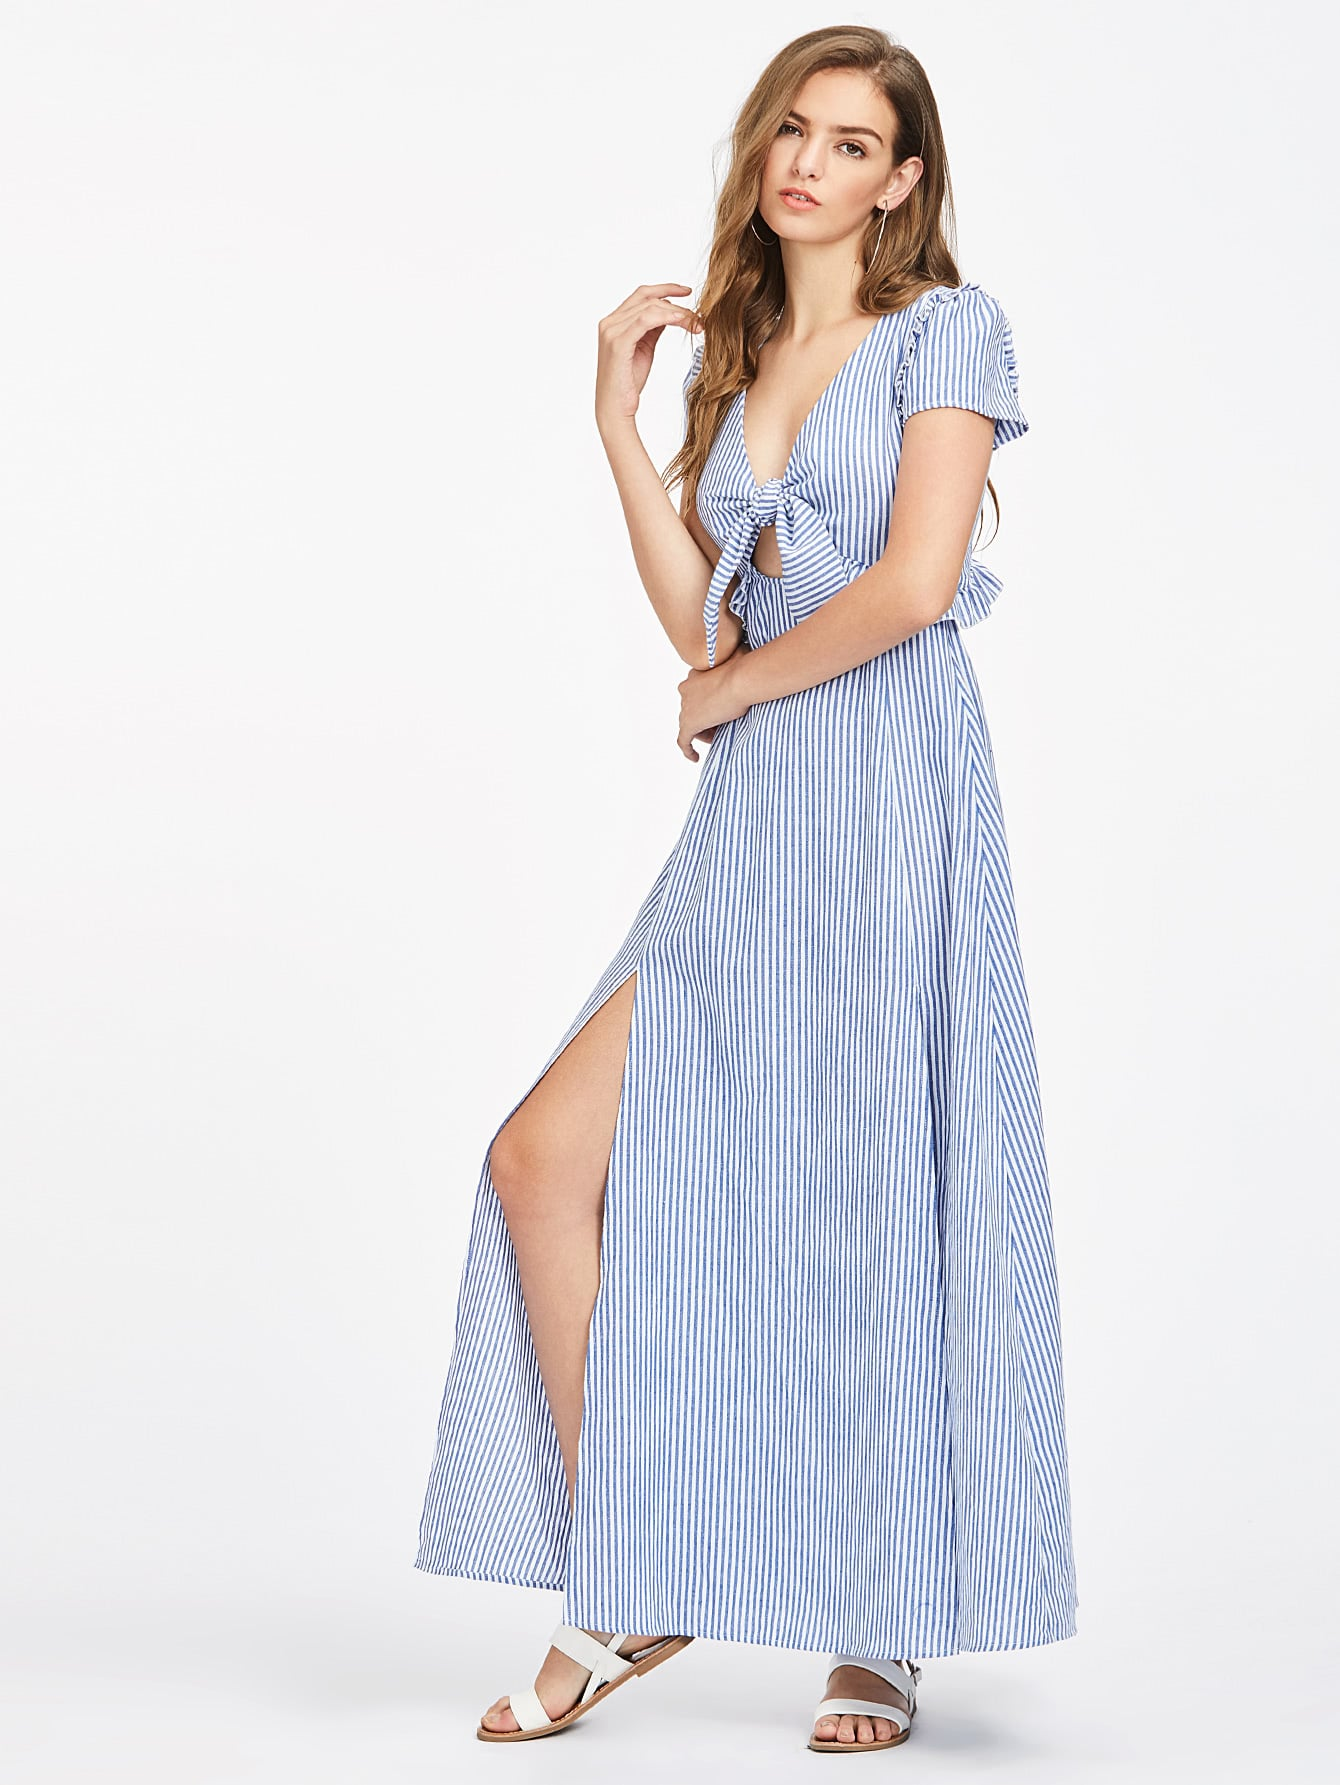 Knot Front Frill Detail M-slit Peekaboo Dress